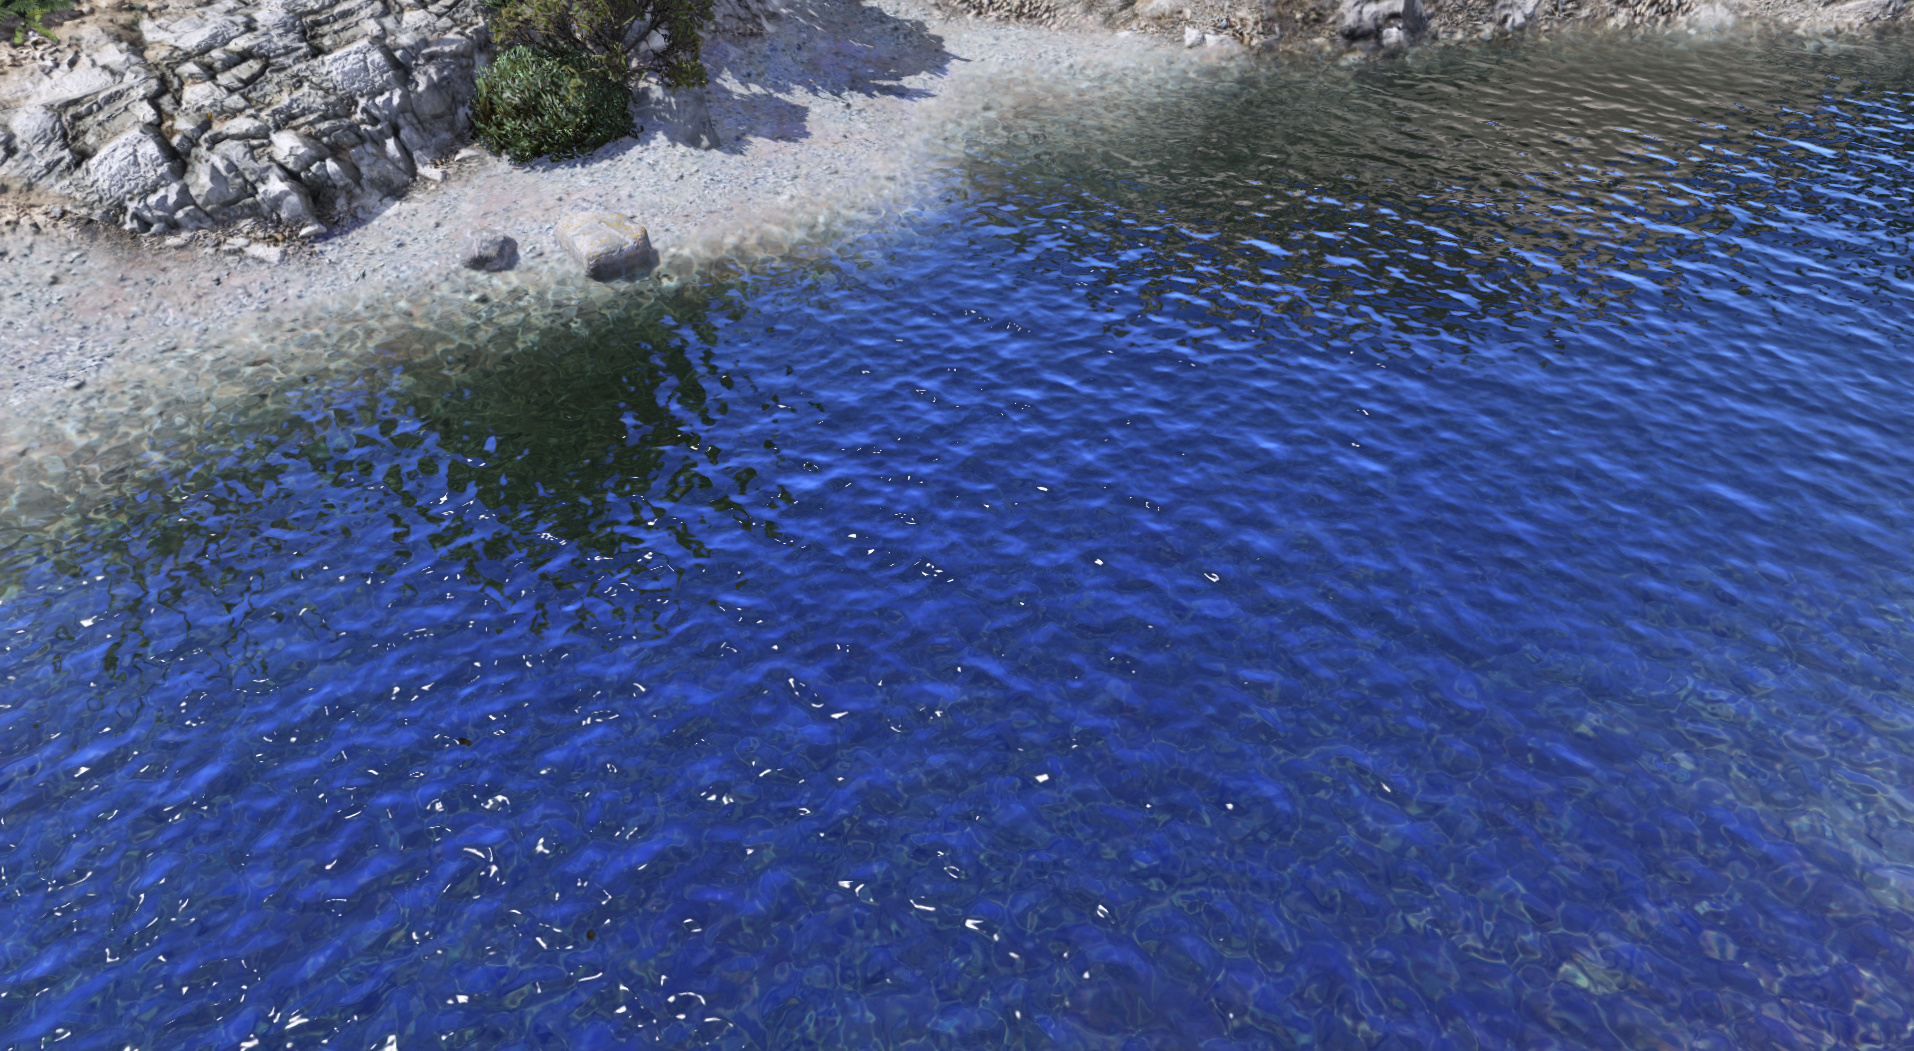 8K][4K][2K] Water Ultra HD [OIV | Manual] - GTA5-Mods com